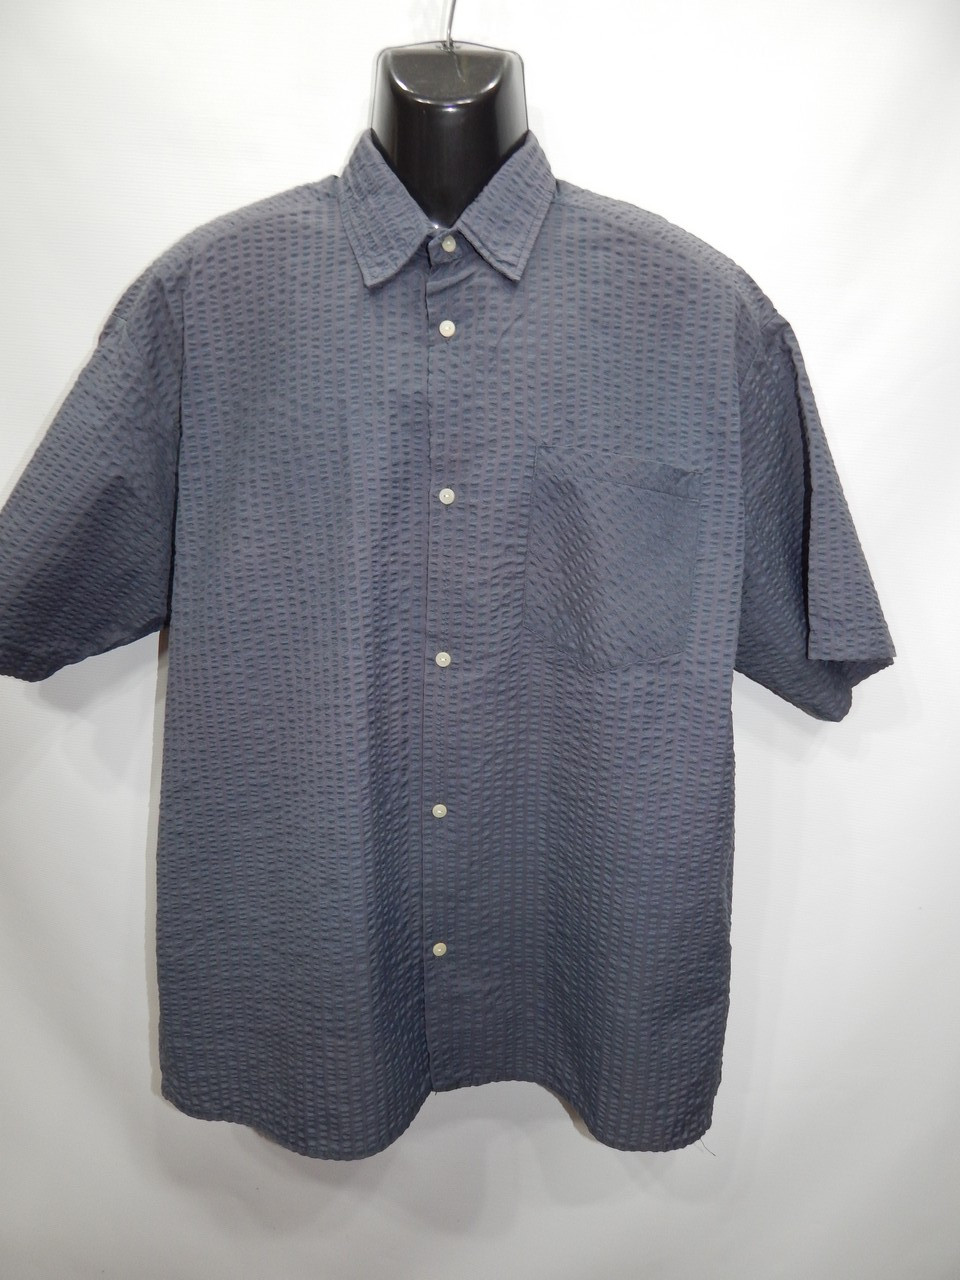 Мужская рубашка с коротким рукавом  (117КР) р.52